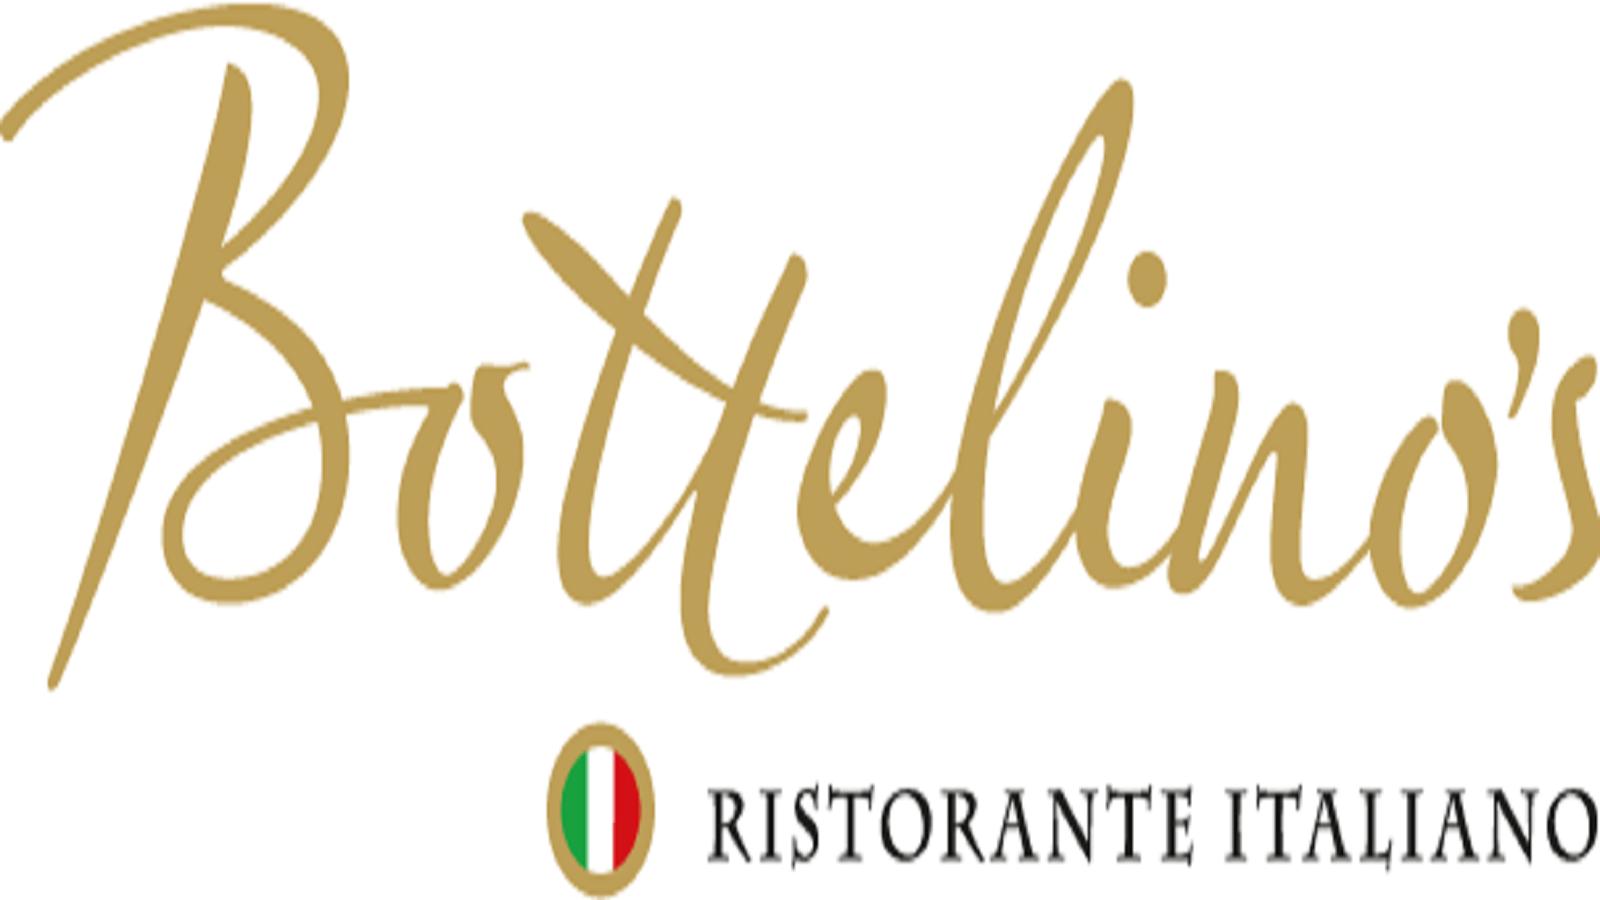 Bottelino's